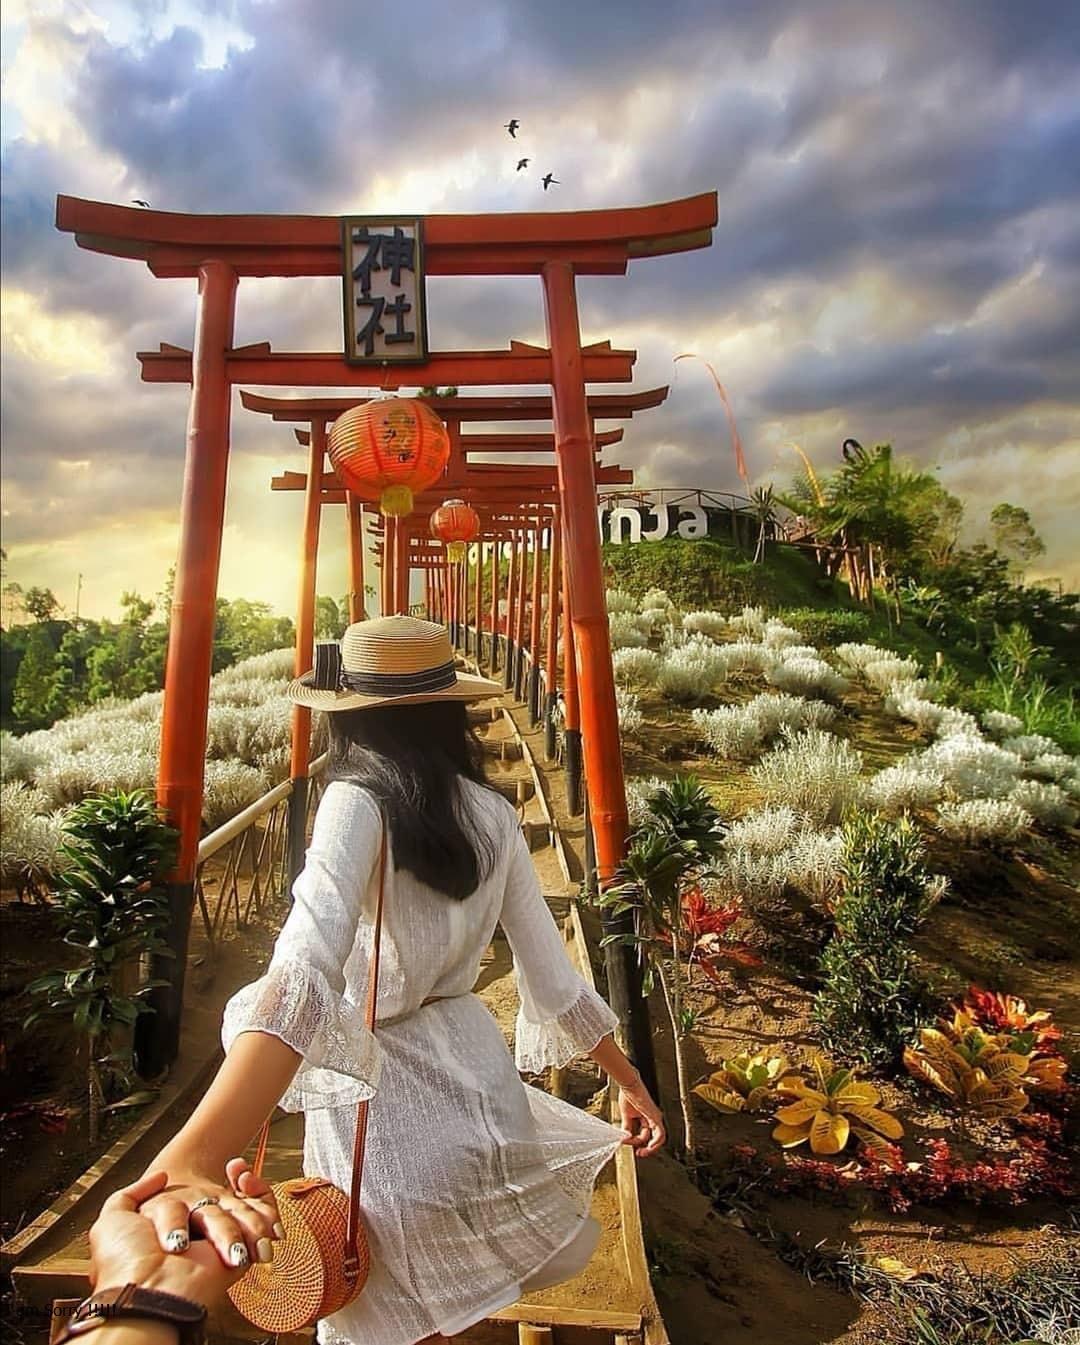 Lokasi dan Tiket Masuk Taman Jinja Bali